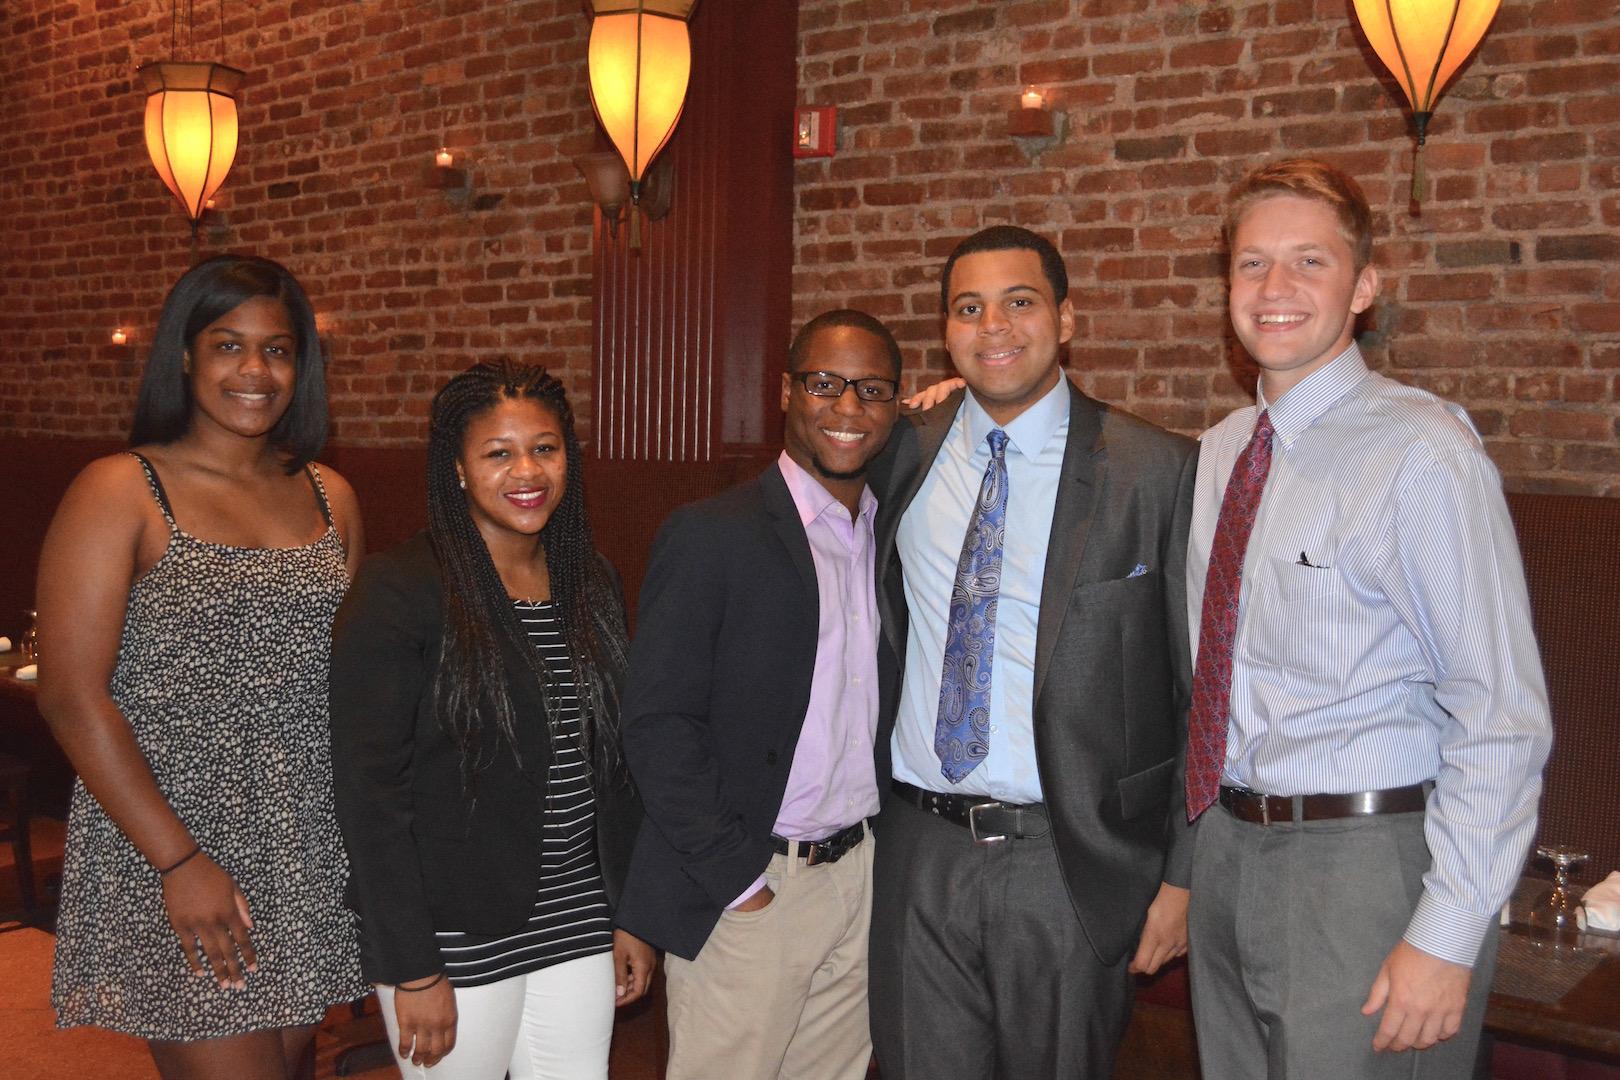 Kevin Lee Bass Scholarship: Maia Hood (2013), Shannon Coombs (2012), Lloyd Richards Jr.  (2014), Christopher Clough (2015) and Thomas Henson (2011)